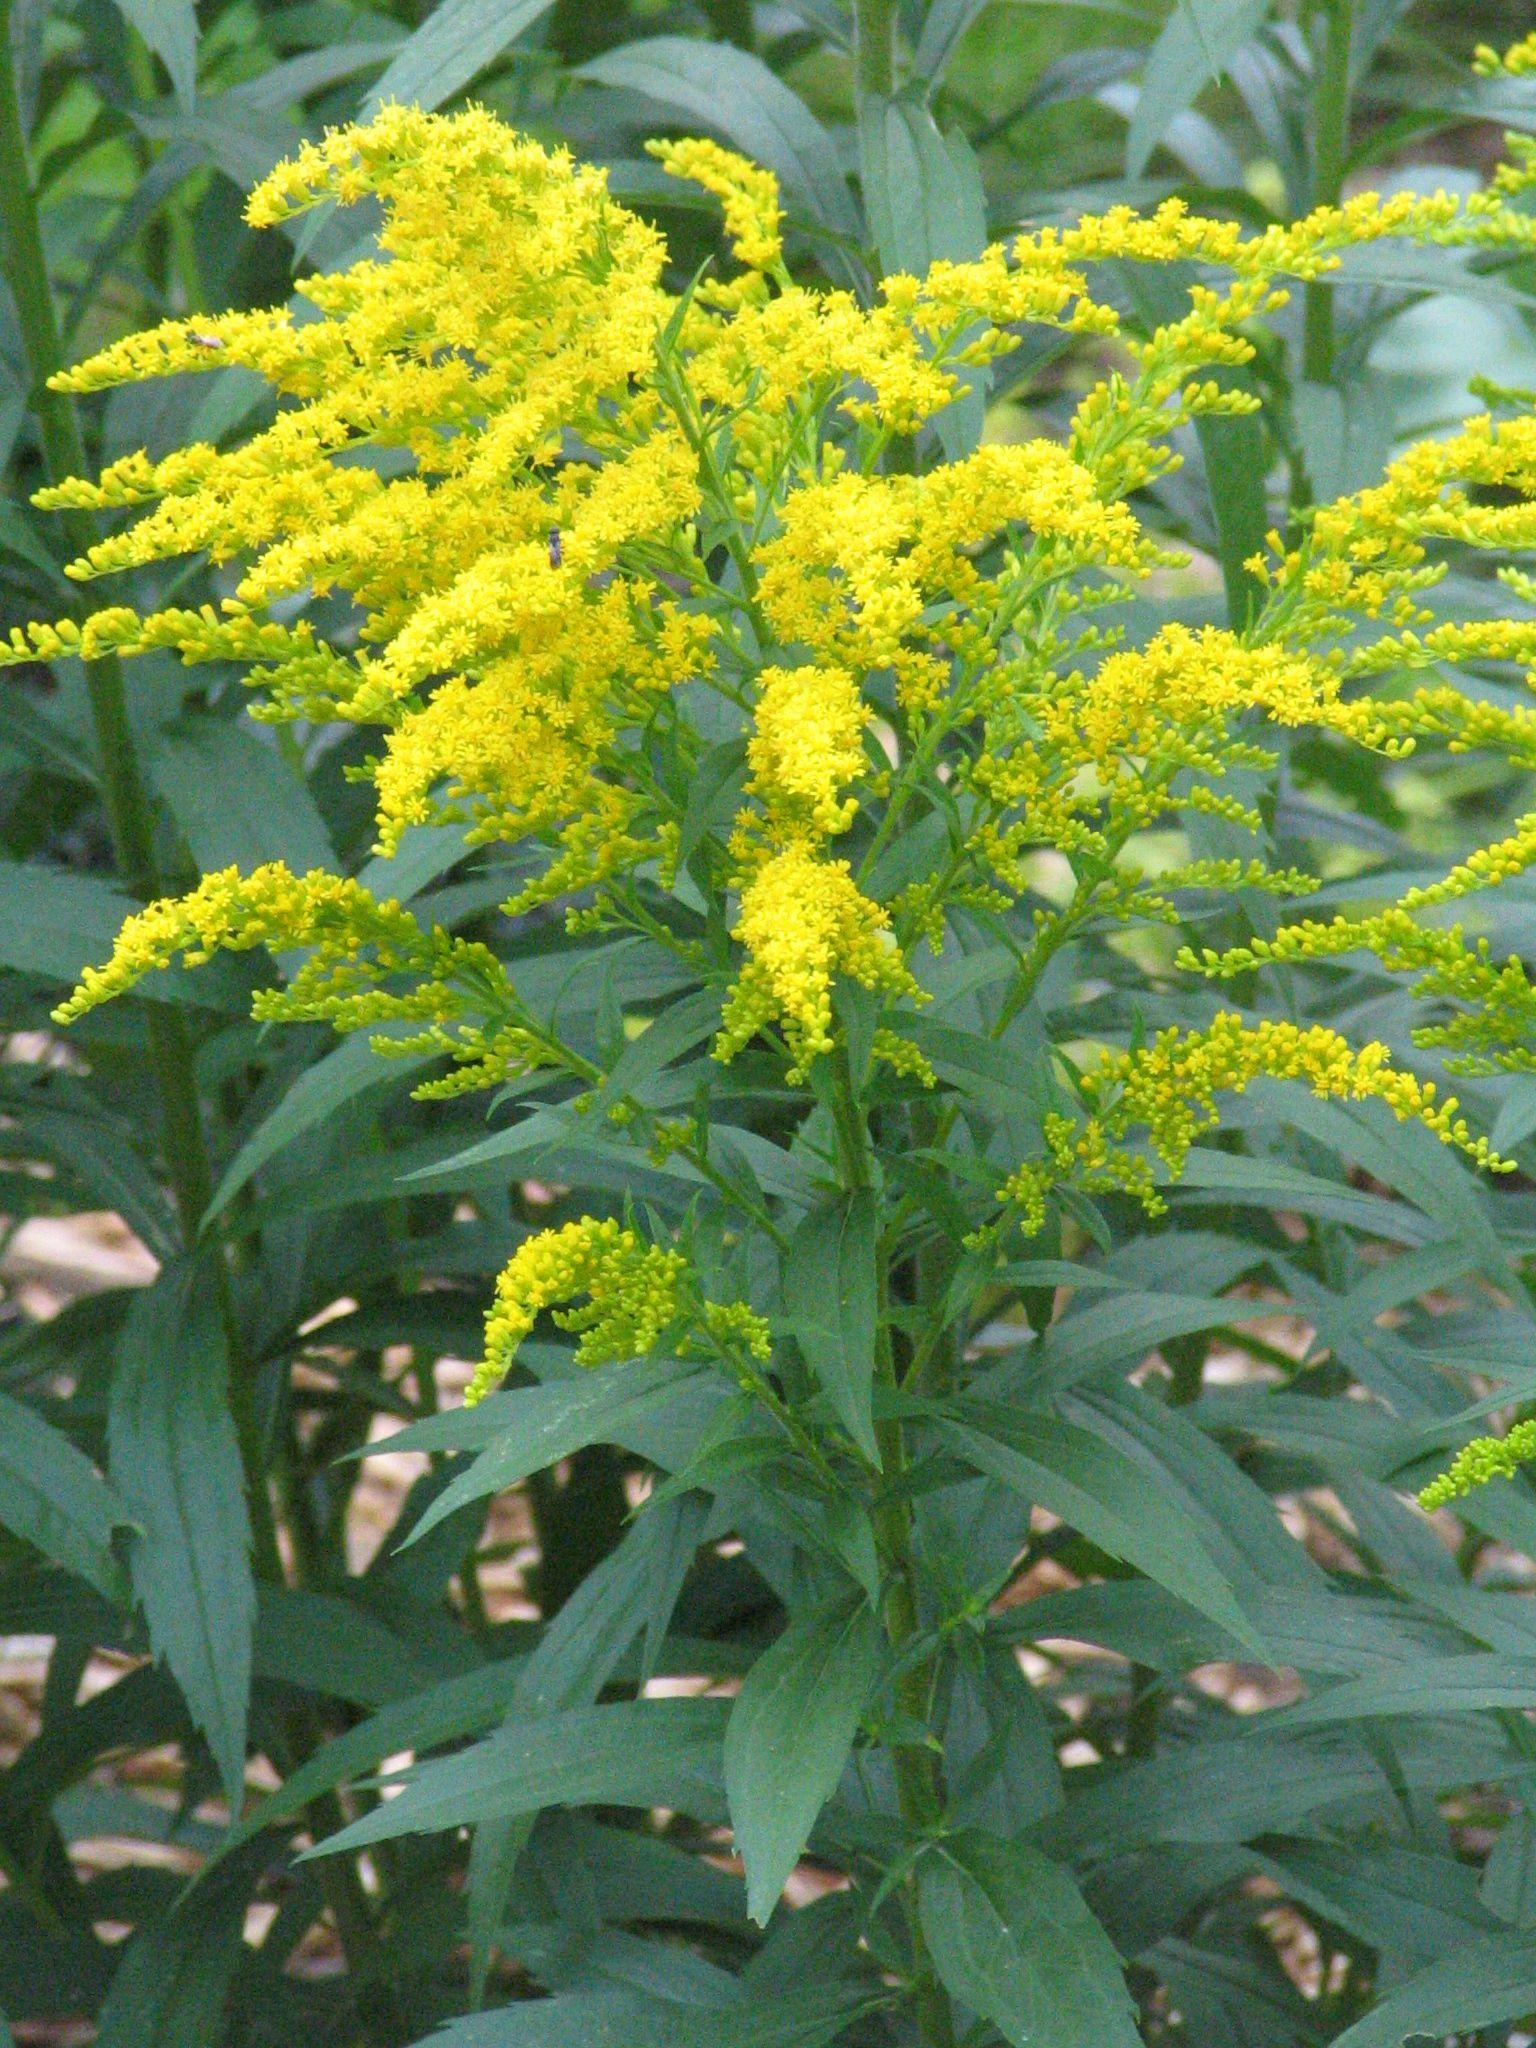 Goldenrod Yellow Flowering Plant Yellow Flowering Plants Plants Healing Plants